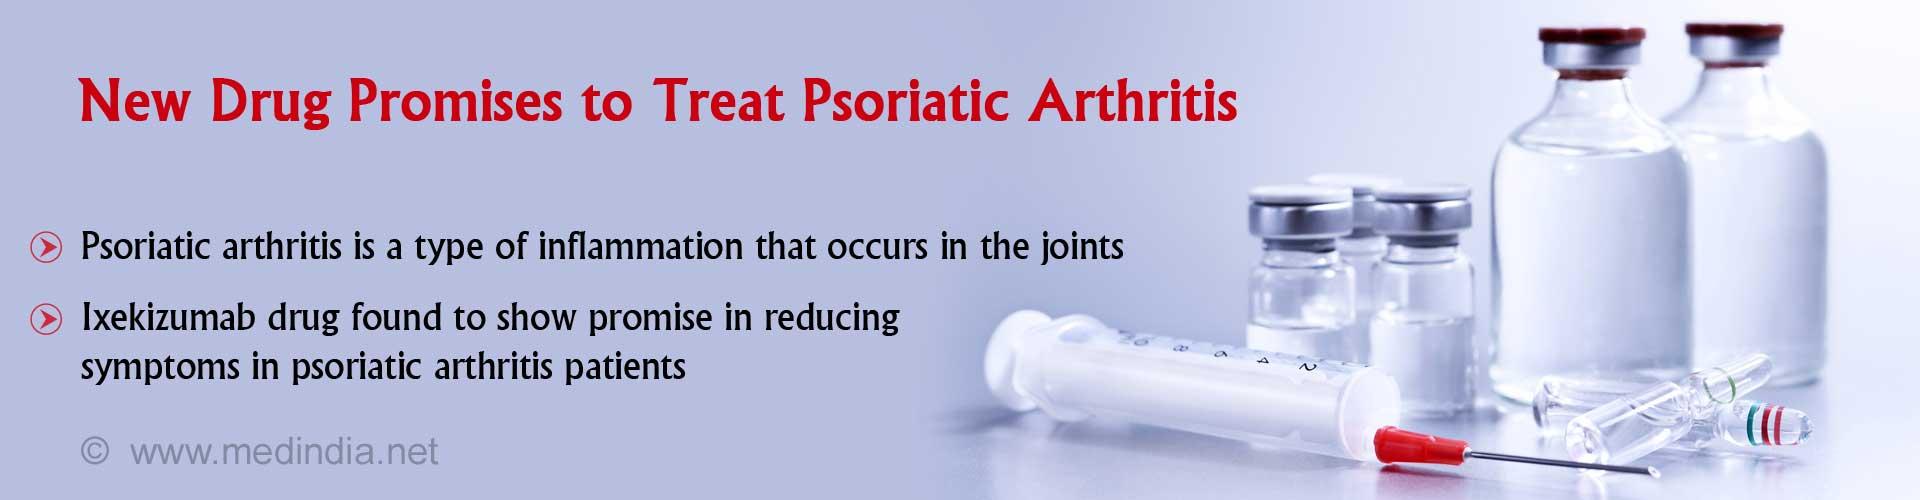 Psoriatic Arthritis New Drug Shows Promise In Reducing the Symptoms